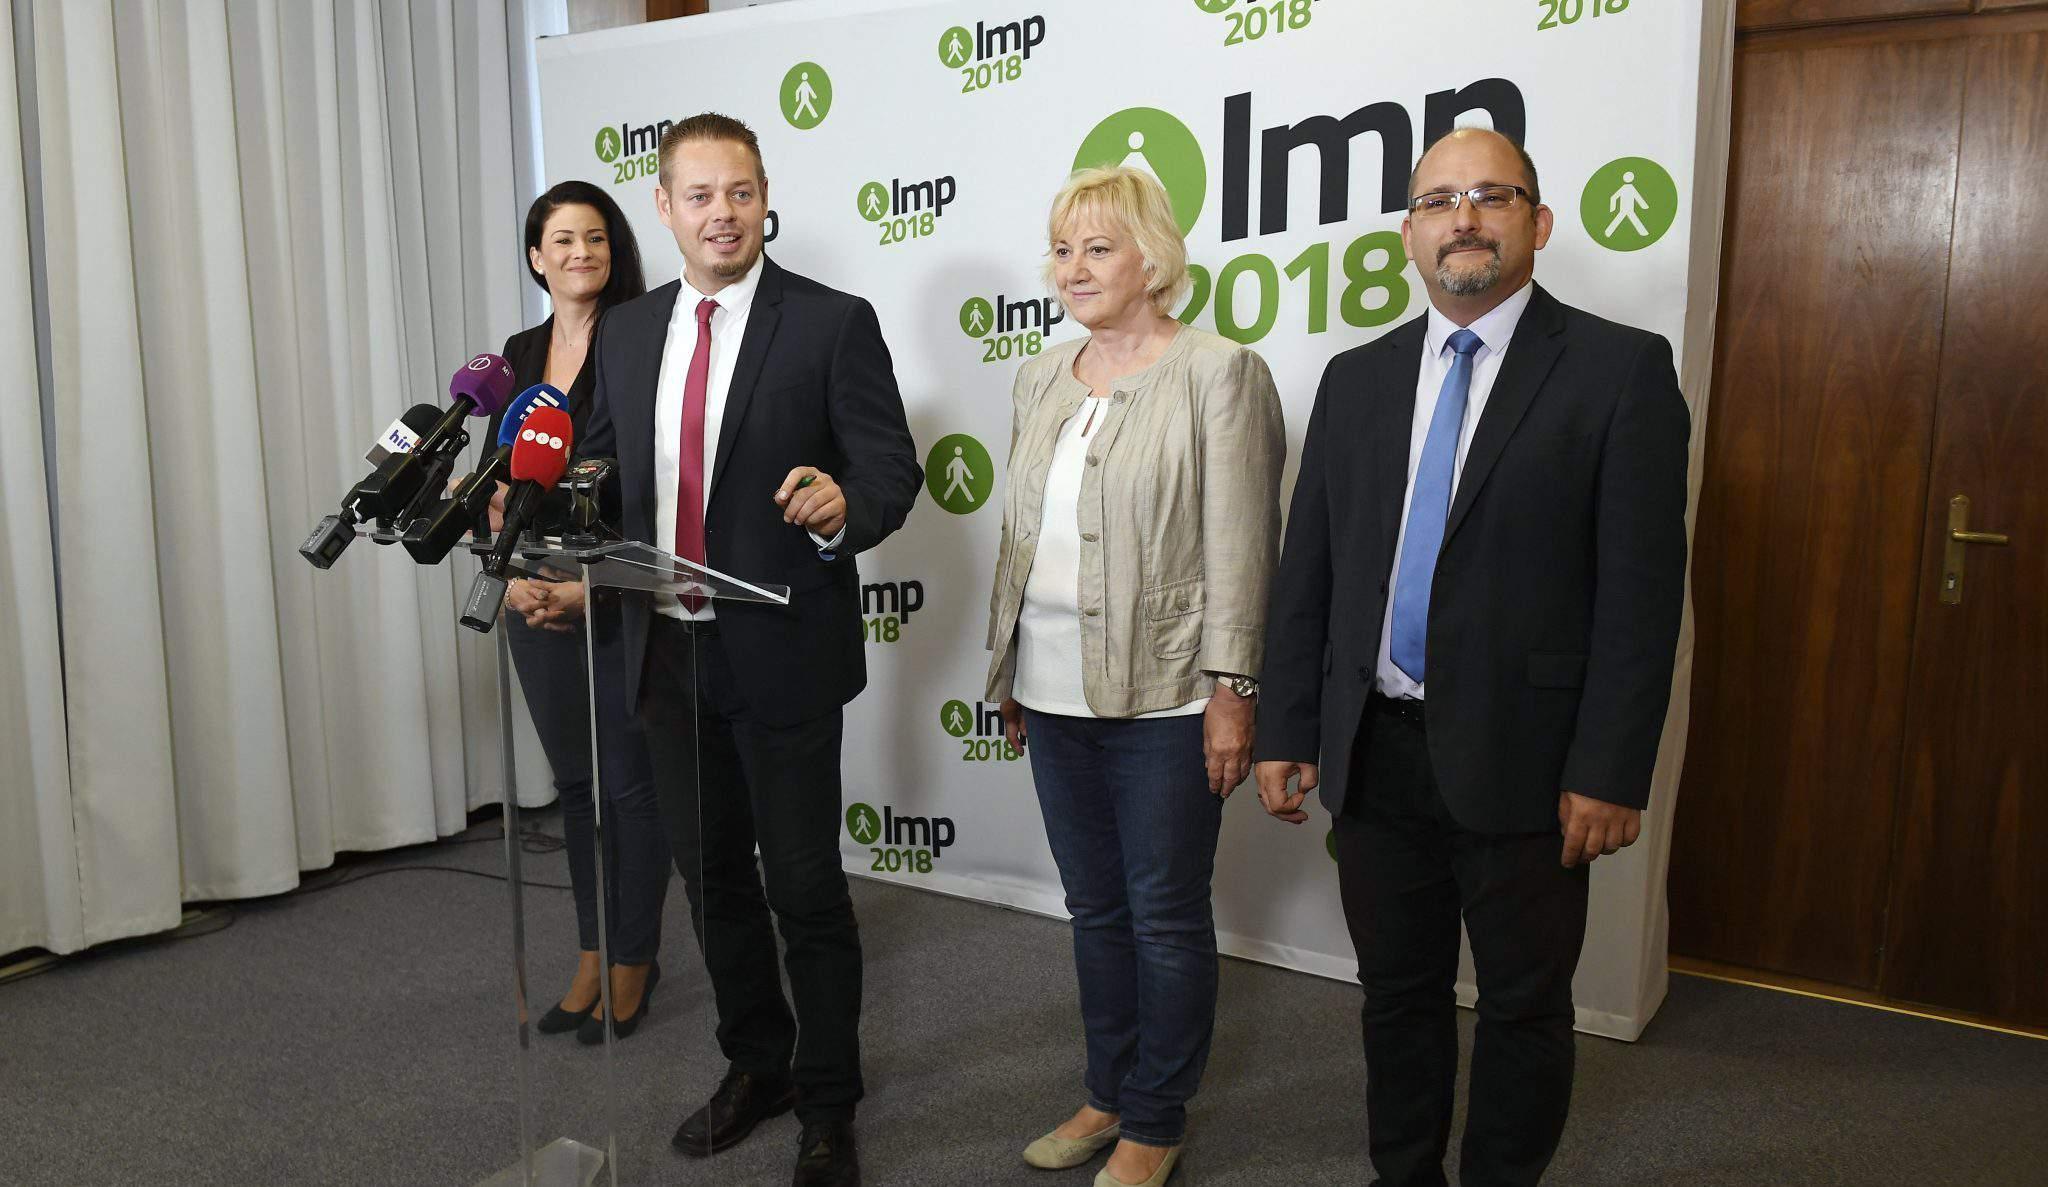 LMP press conference